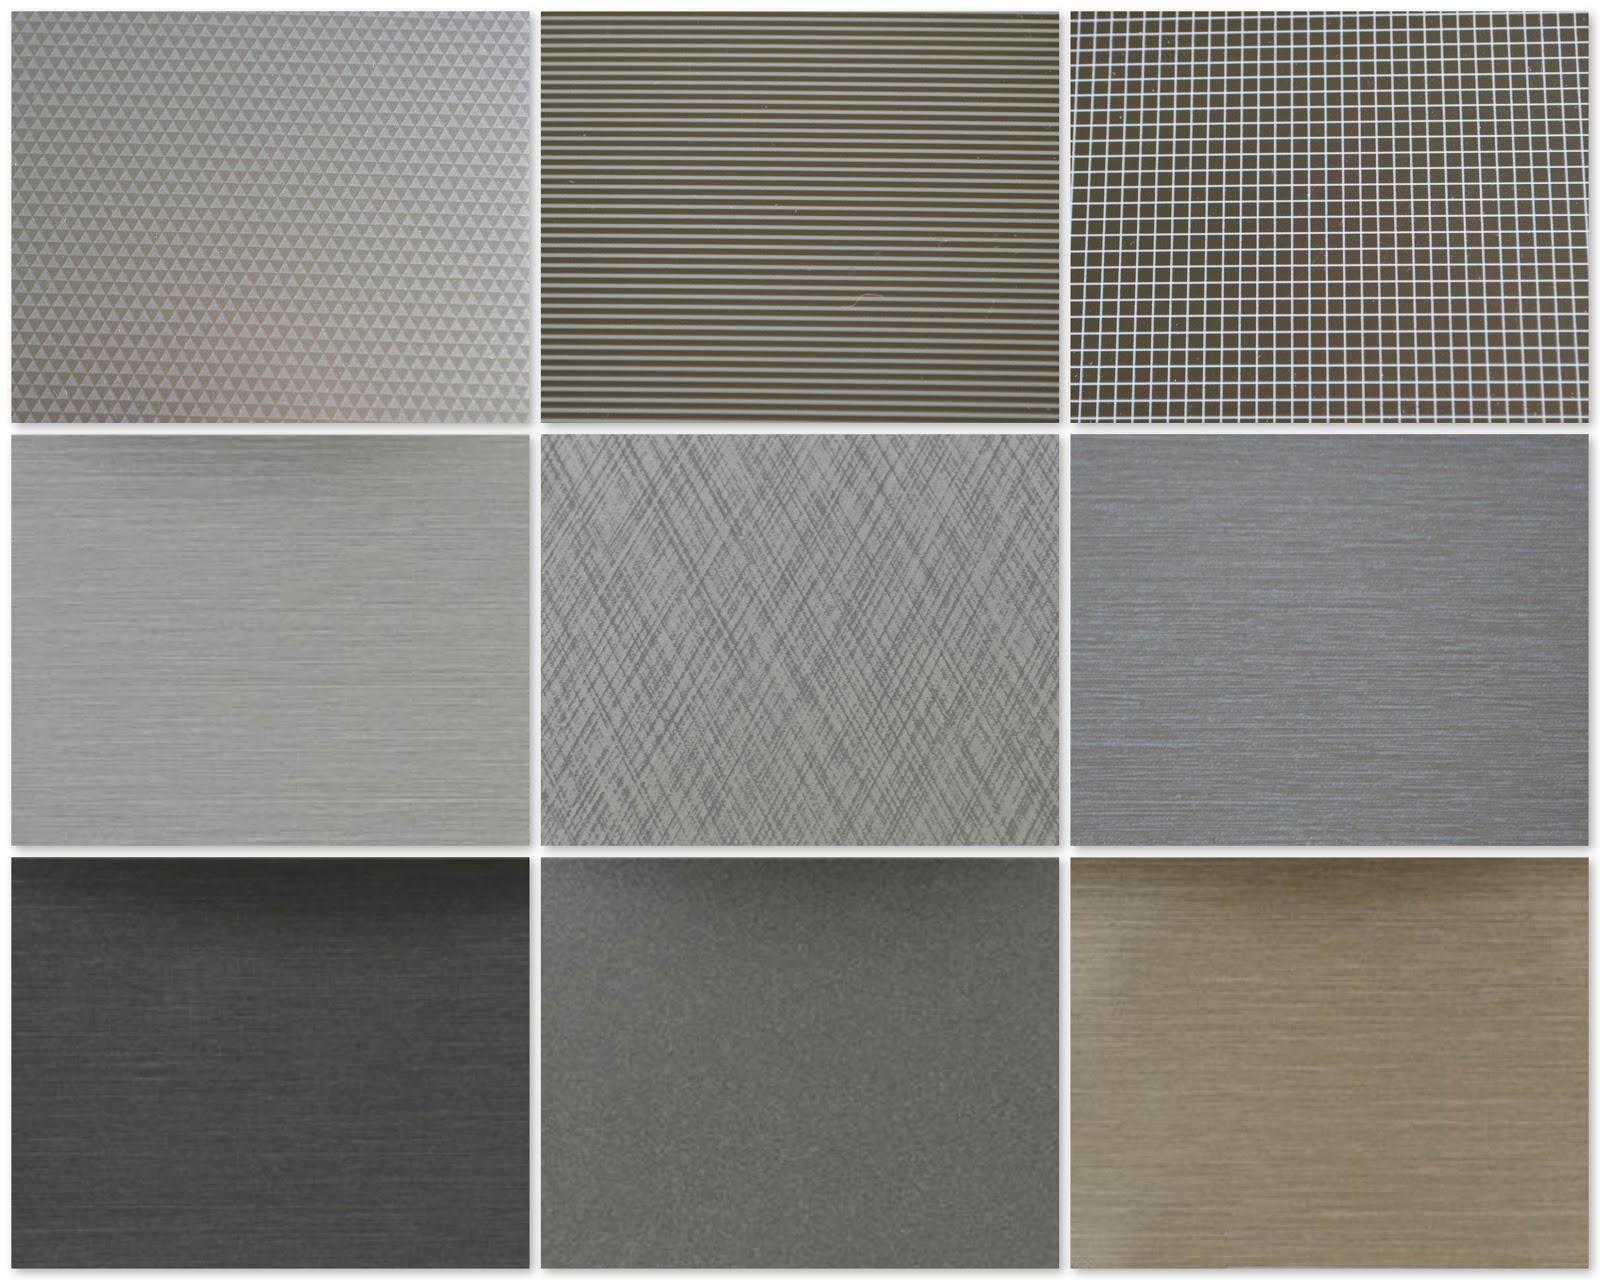 endearing 30 decorative plastic panels decorating. Black Bedroom Furniture Sets. Home Design Ideas